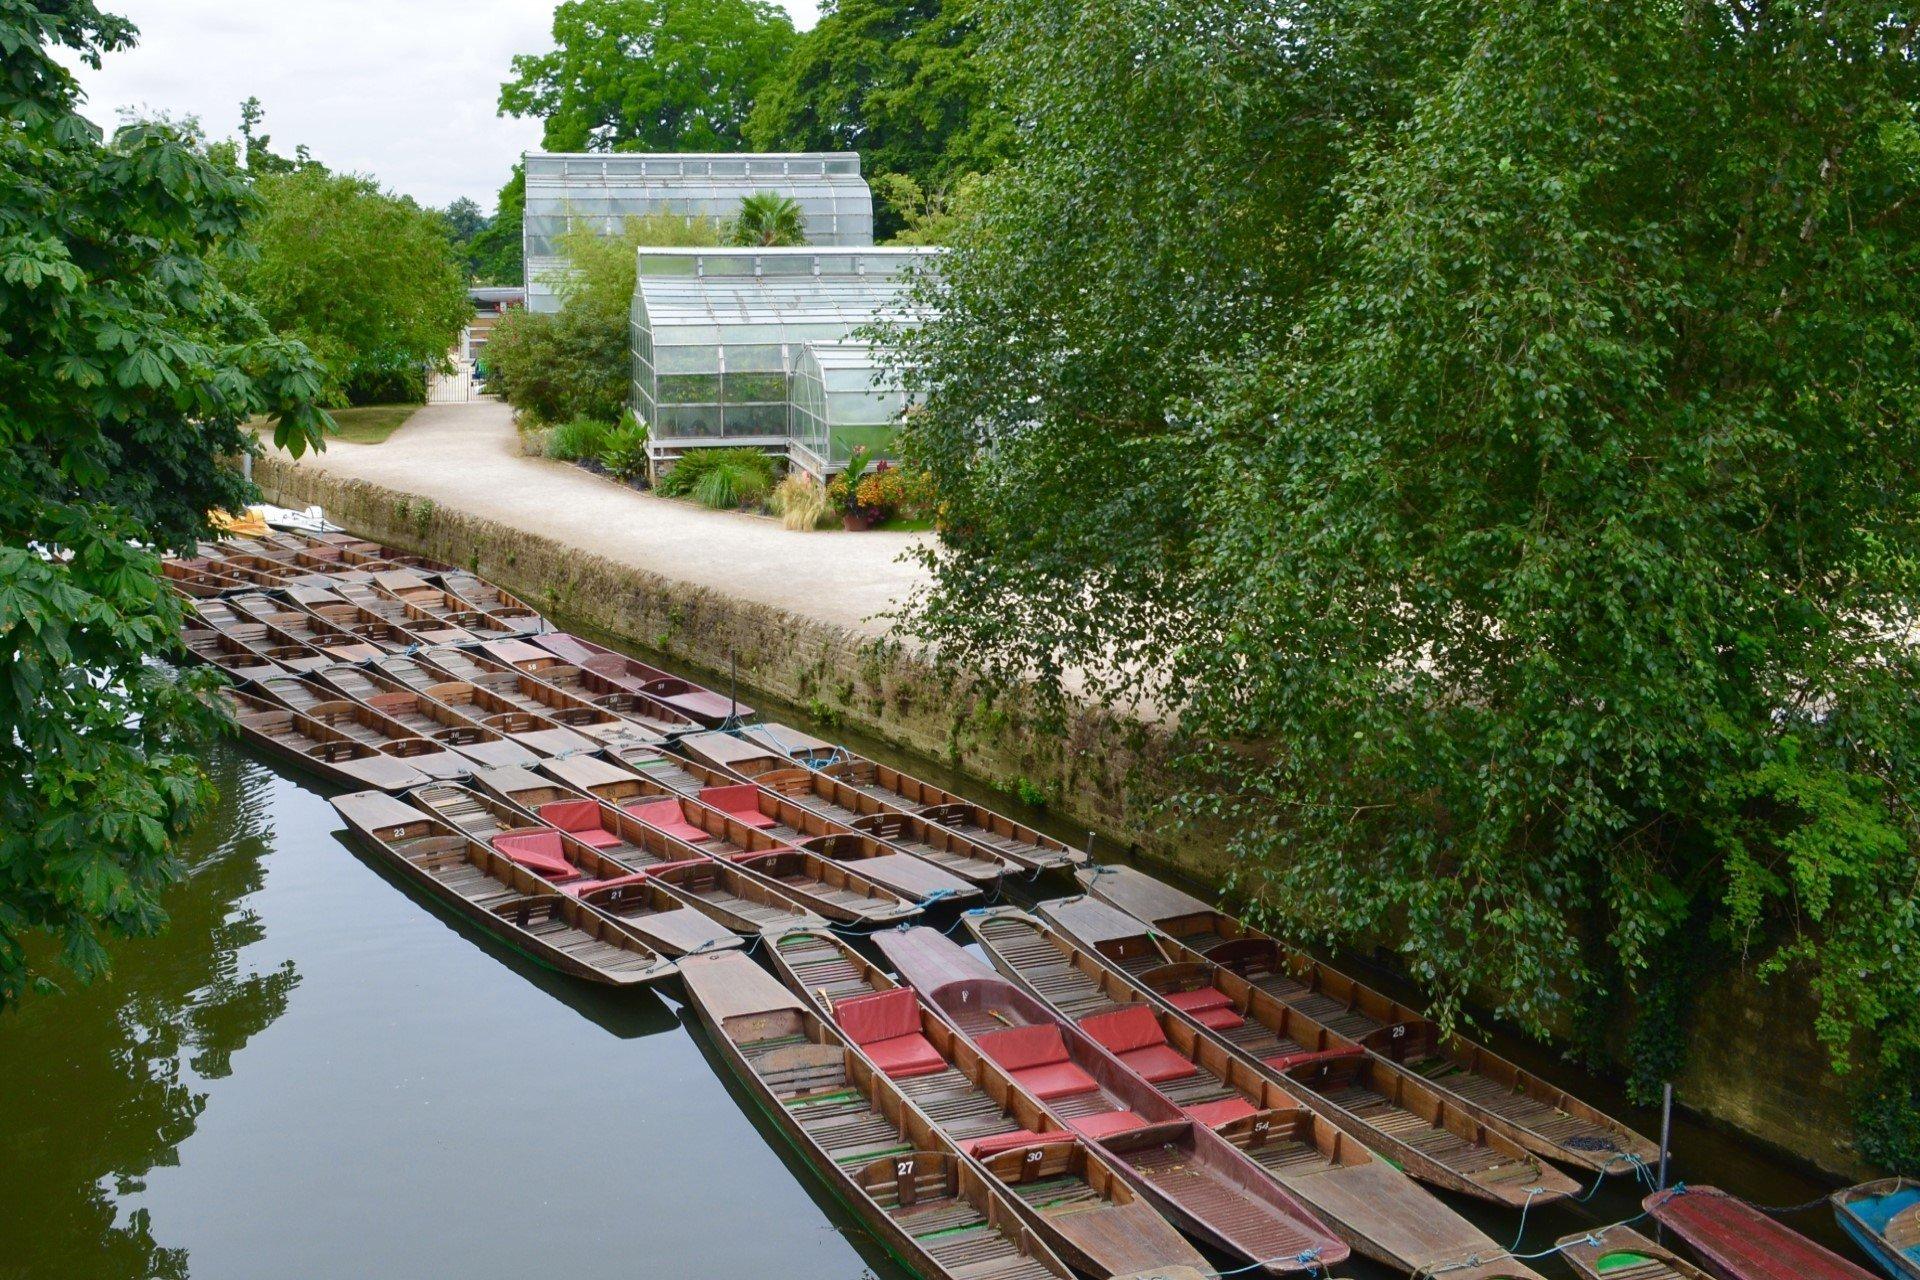 Oxford Botanic Garden - The Glasshouses